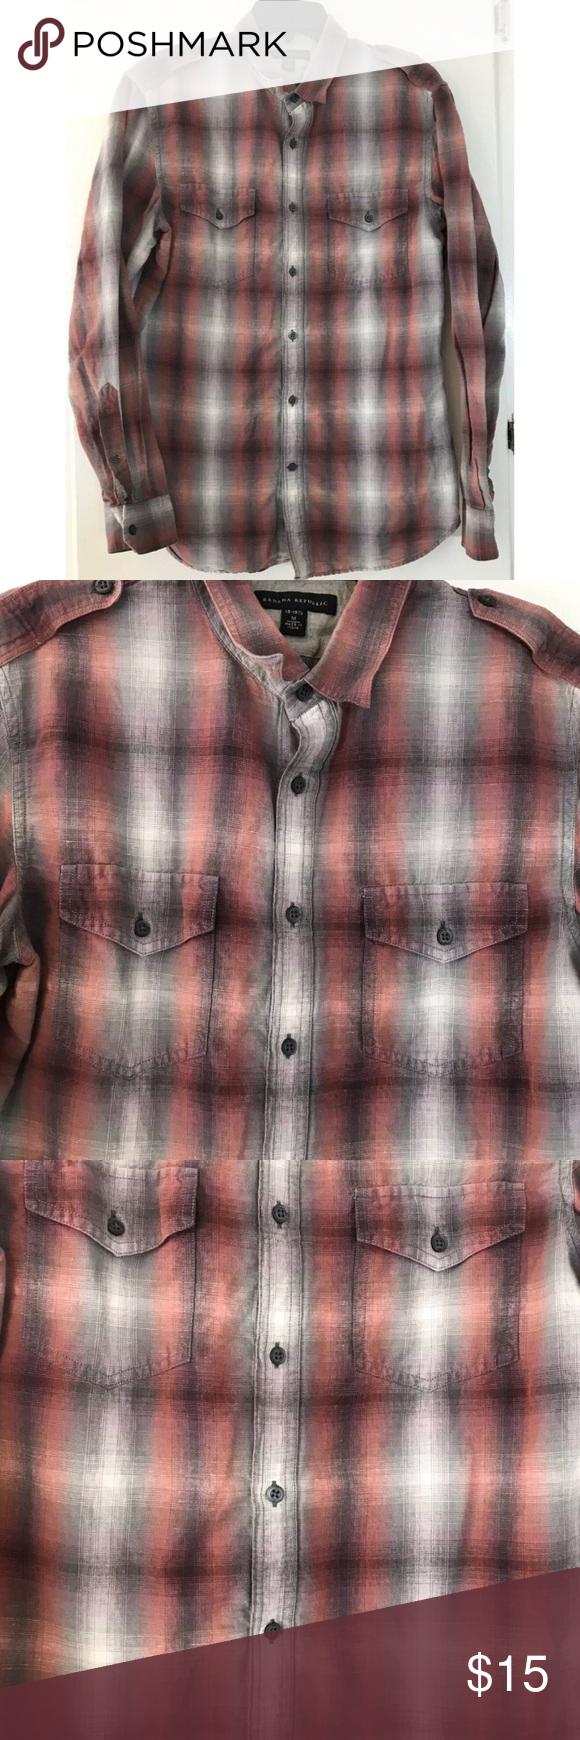 Men's Banana Republic Shirt Sz Medium 1515 1/2 Colorful